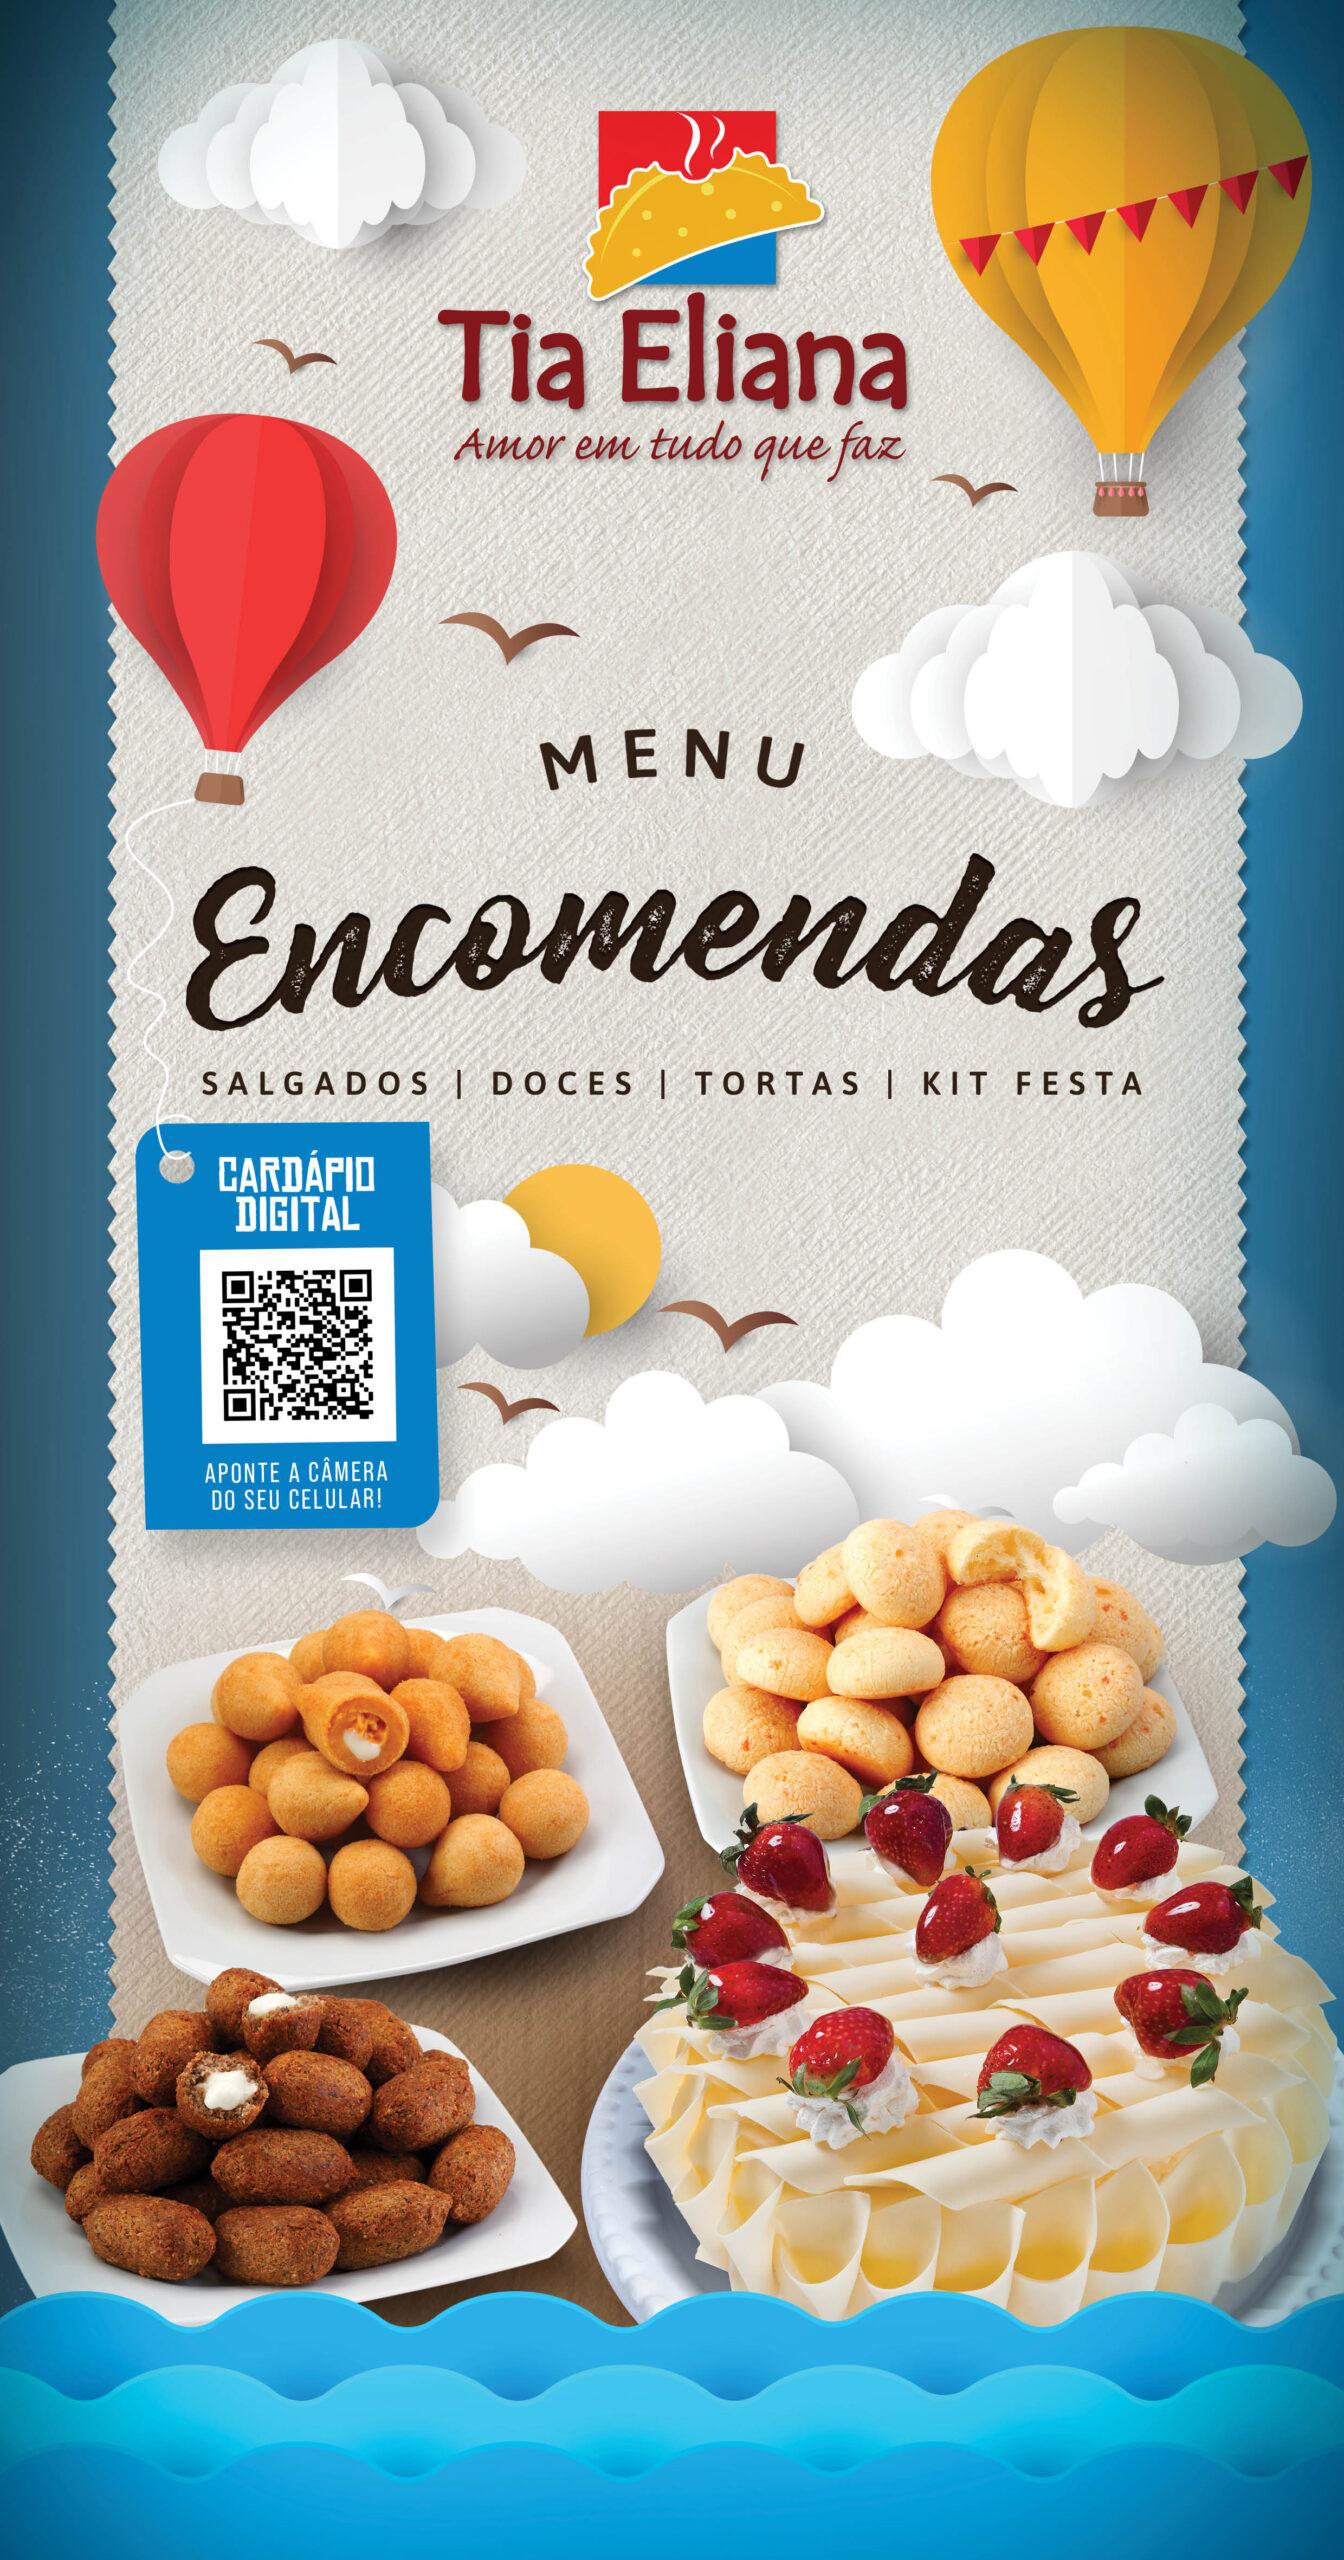 cardapio_encomendas_40x21cm_tia_eliana_interior_itabira_sb_v2-scaled Encomendas - Itabira - SB